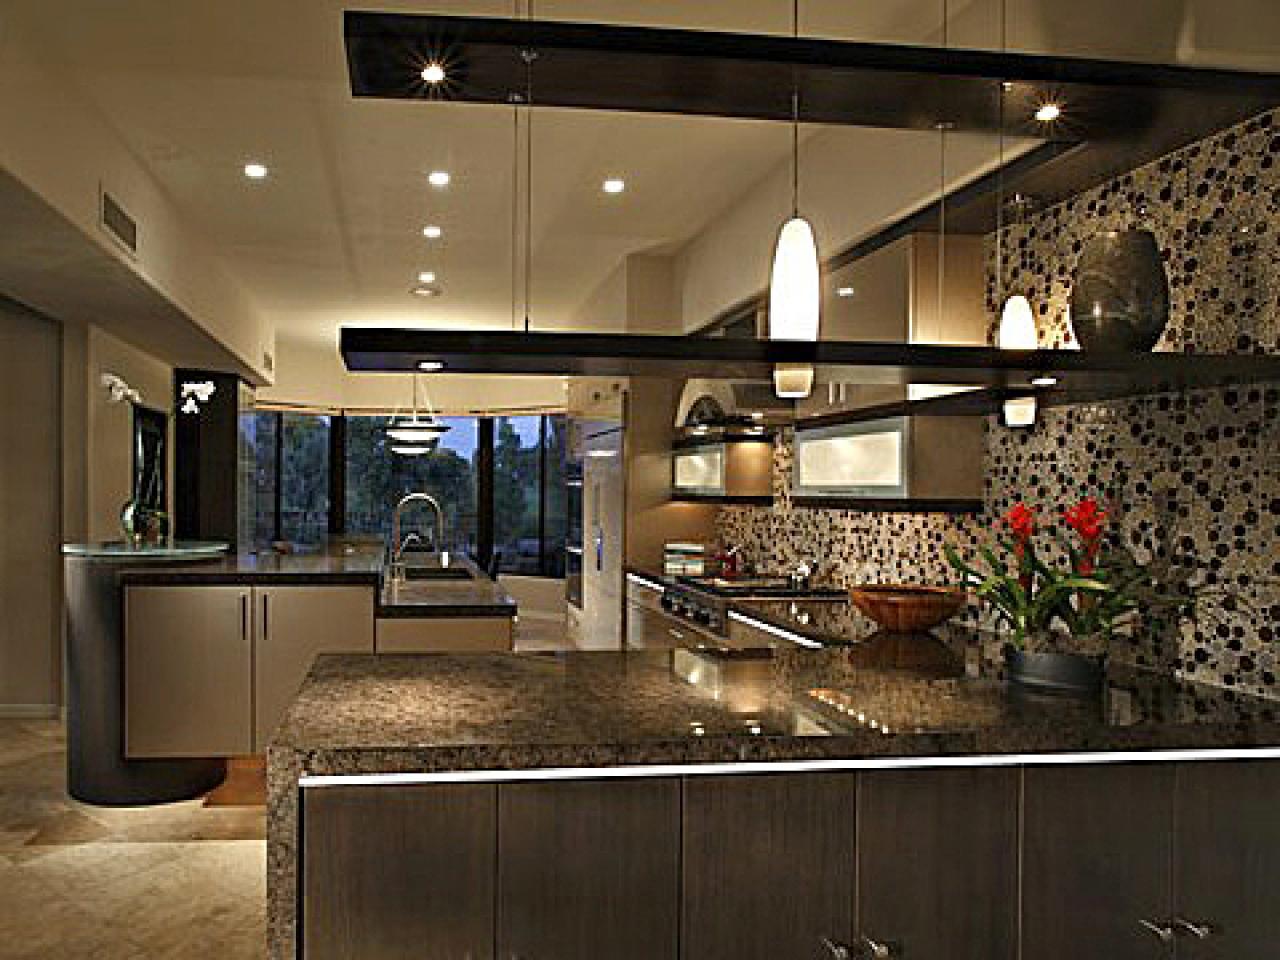 Design Ideas for Kitchen Shelving and Racks | DIY Kitchen ...